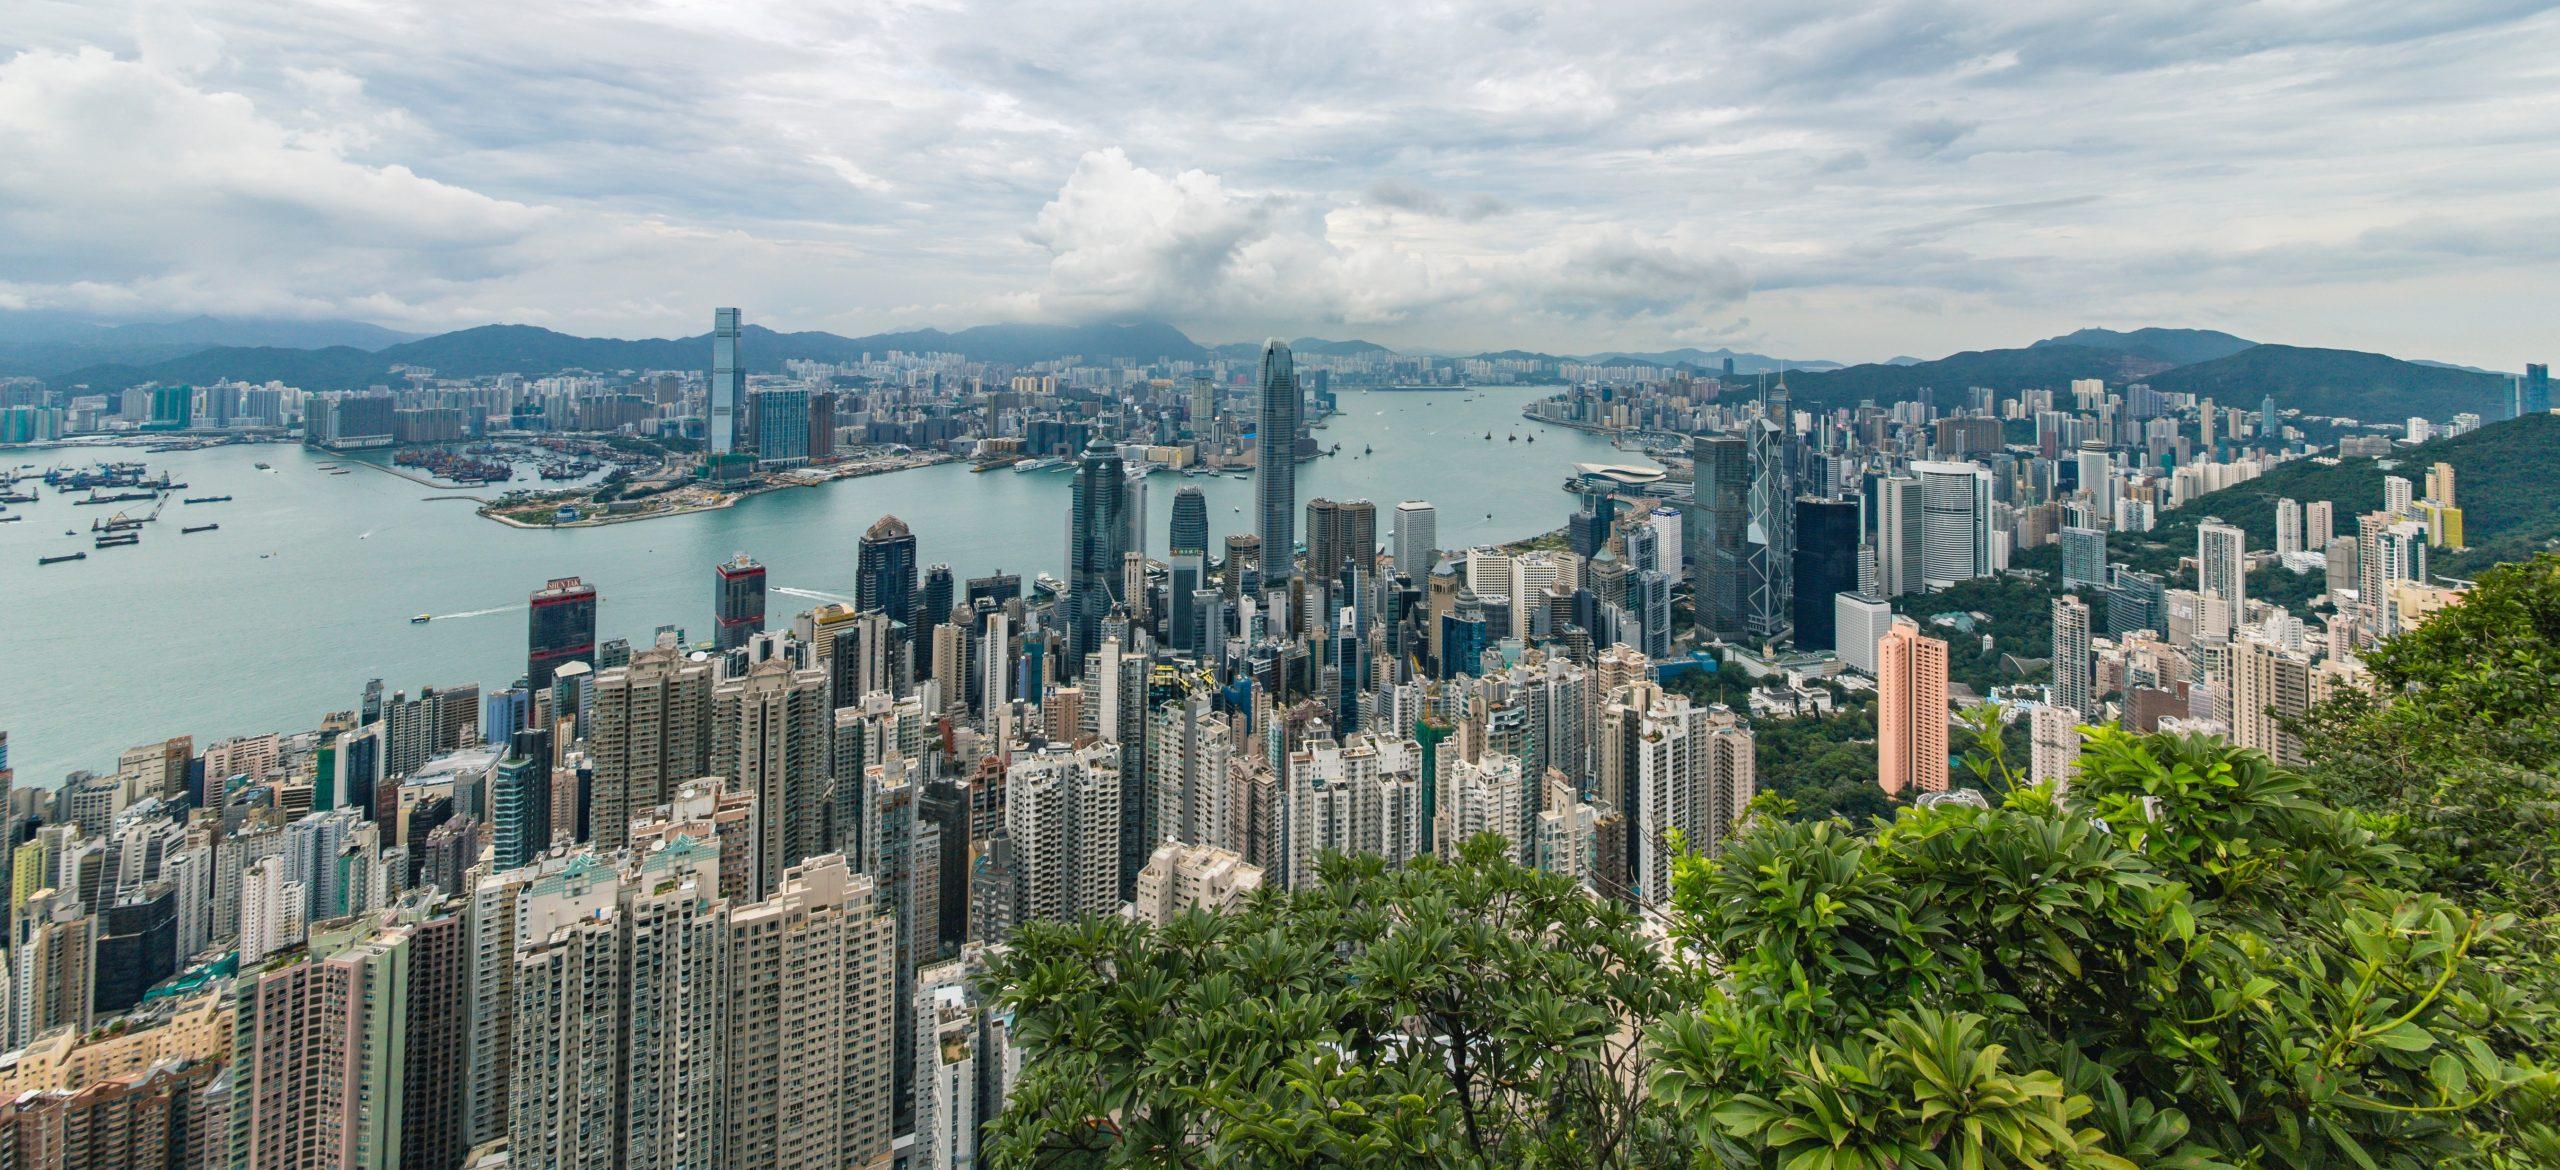 Remains of the Past: Why Hong Kongers are Leaving Hong Kong